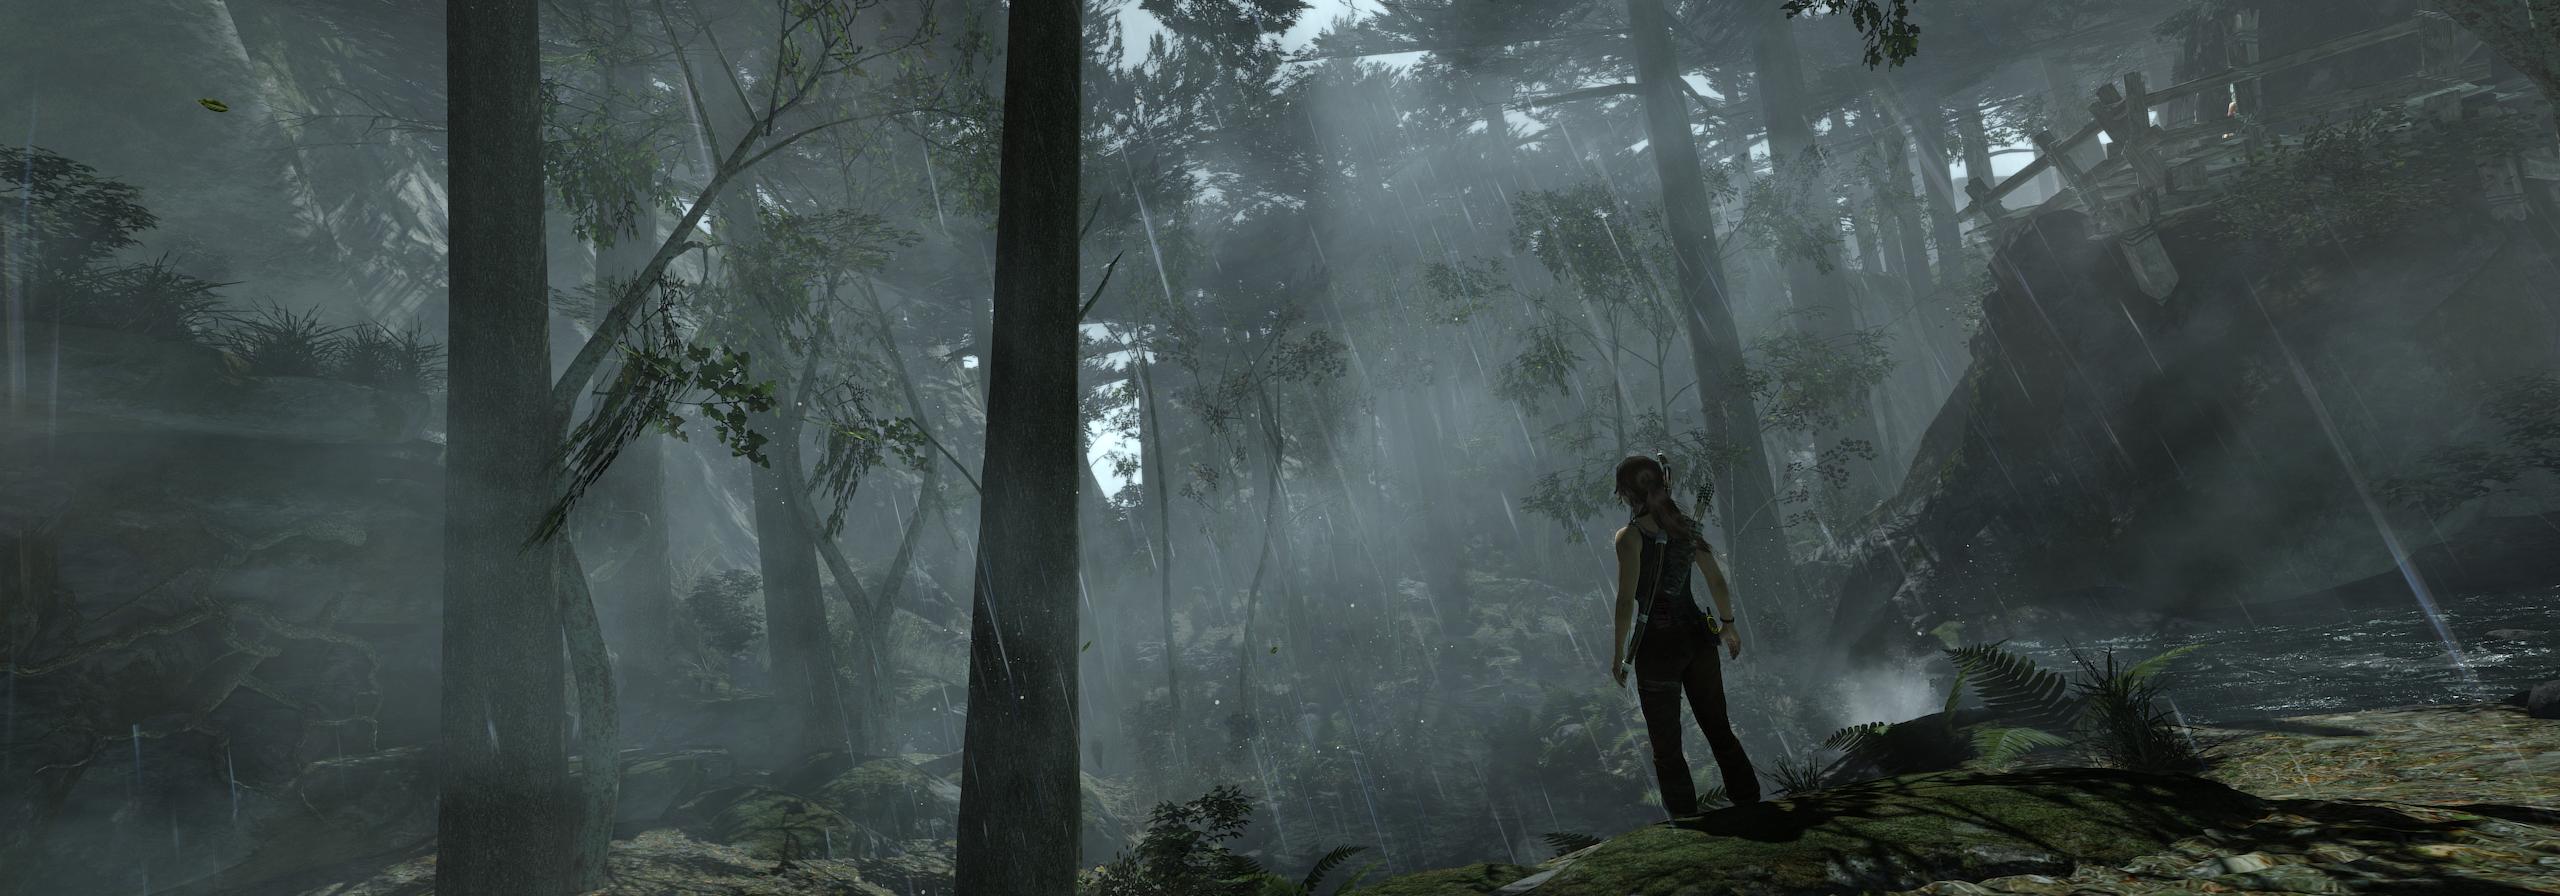 anotherworldalt.png - Tomb Raider (2013)